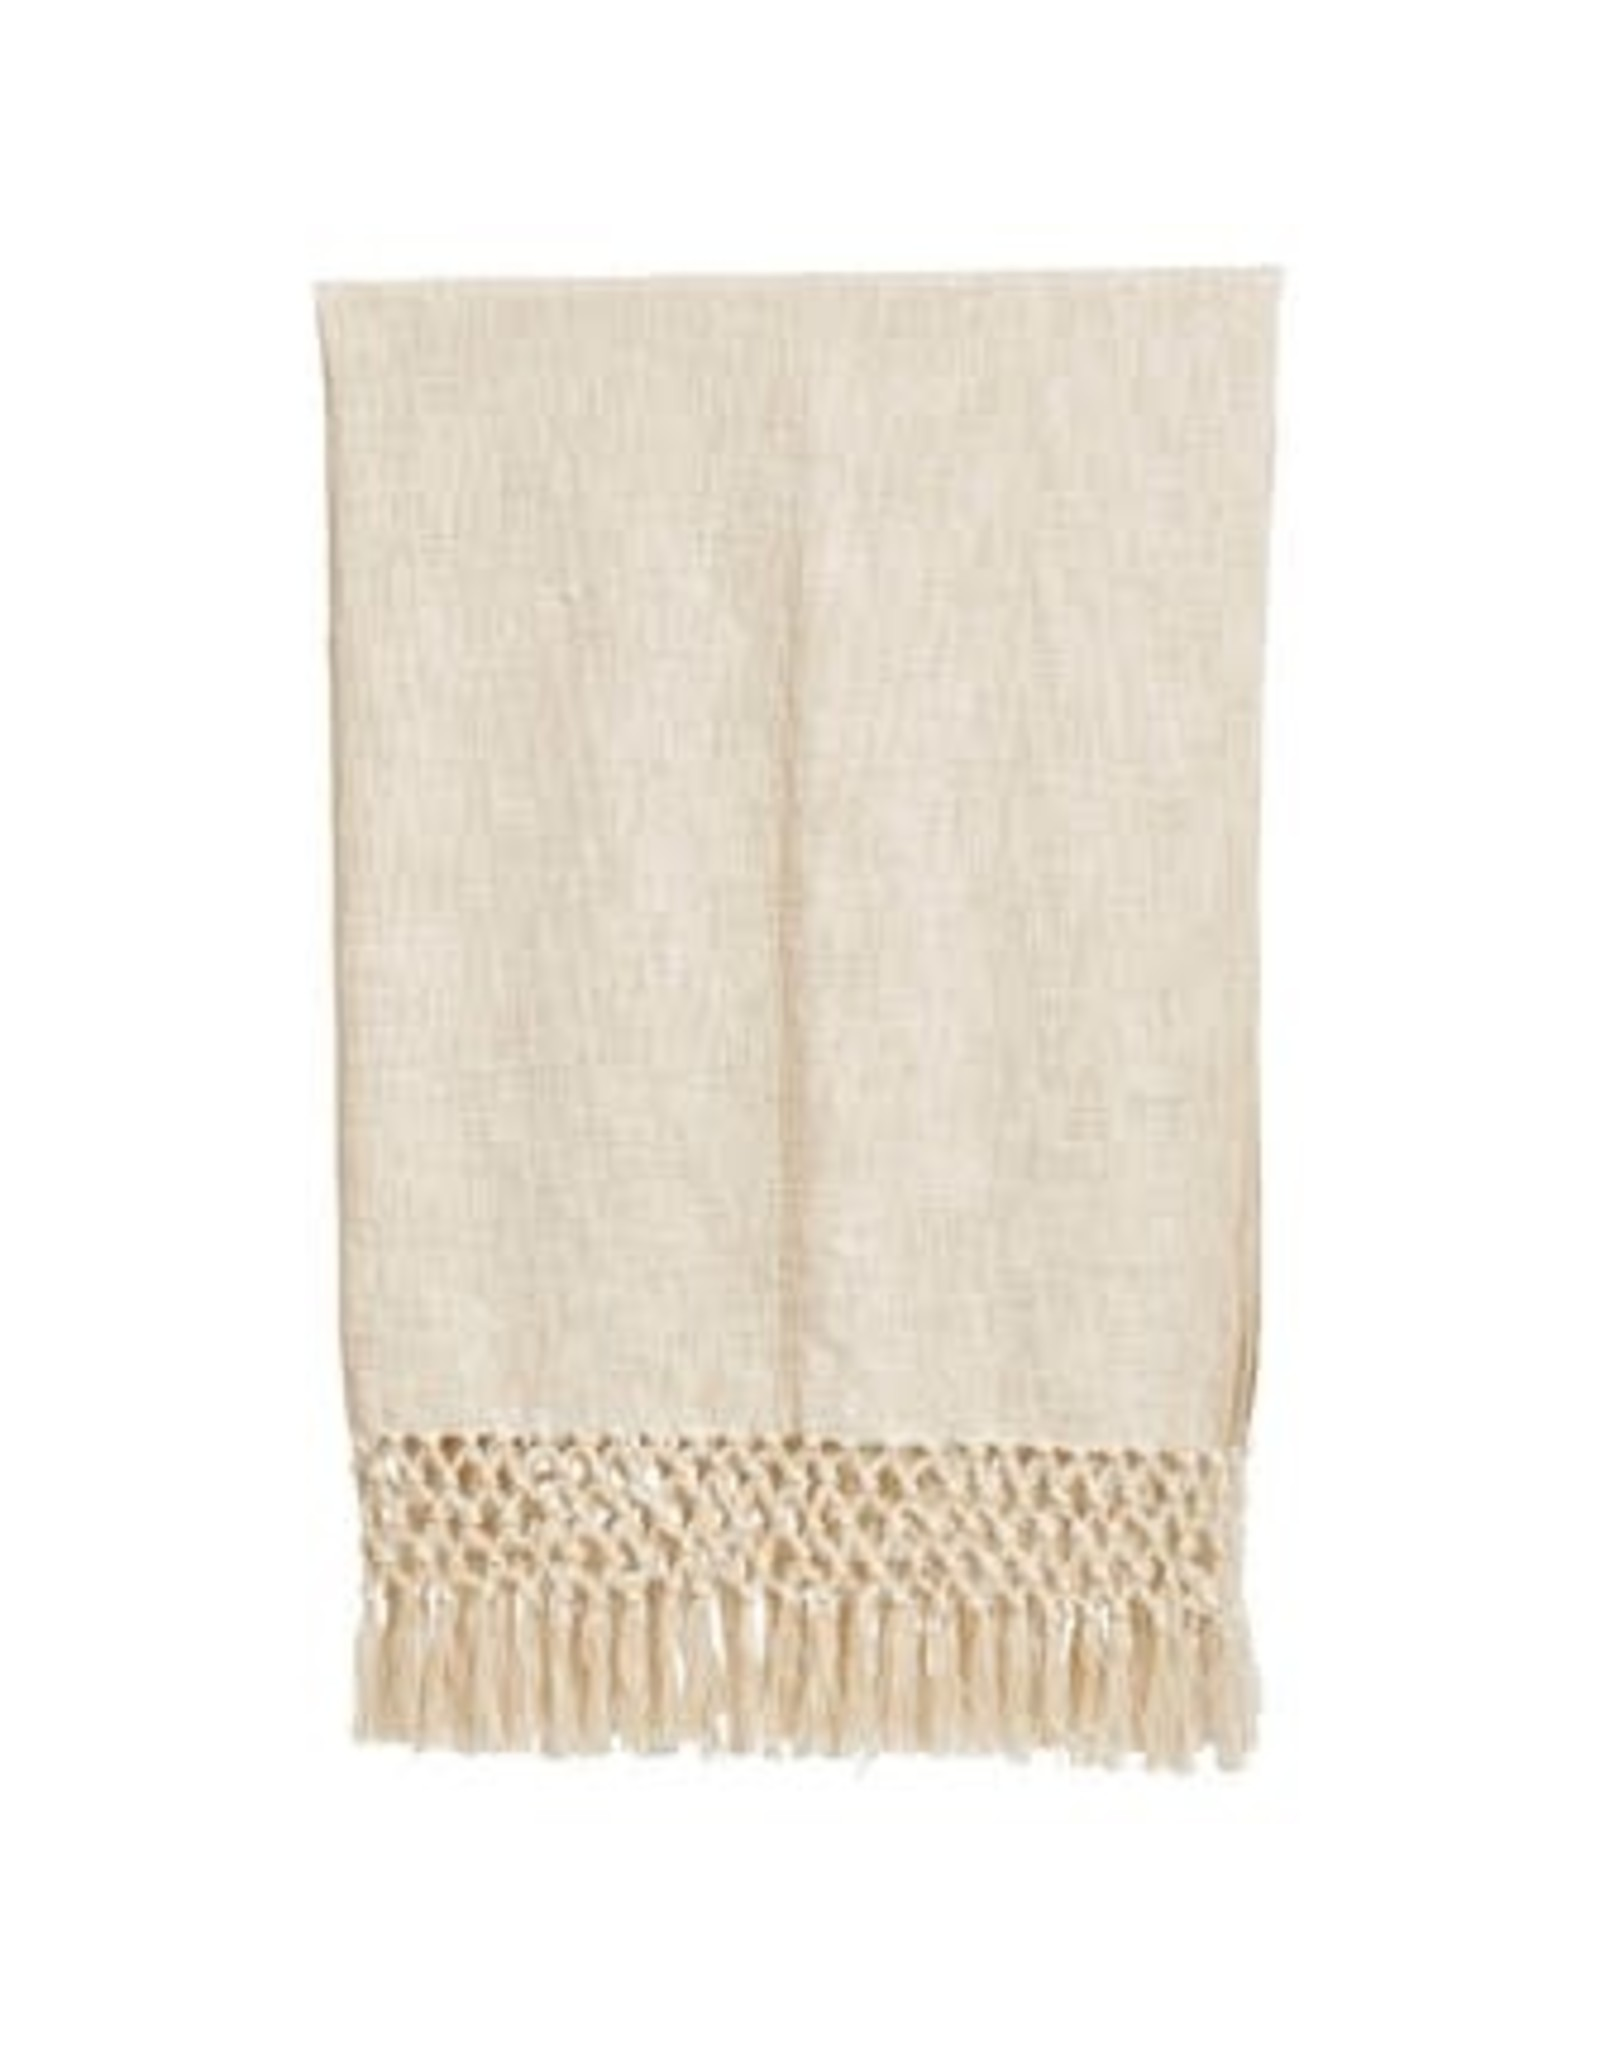 "Creative Co-Op 50""L x 60""W Woven Cotton Throw w/ Crochet & Fringe, Cream Color"